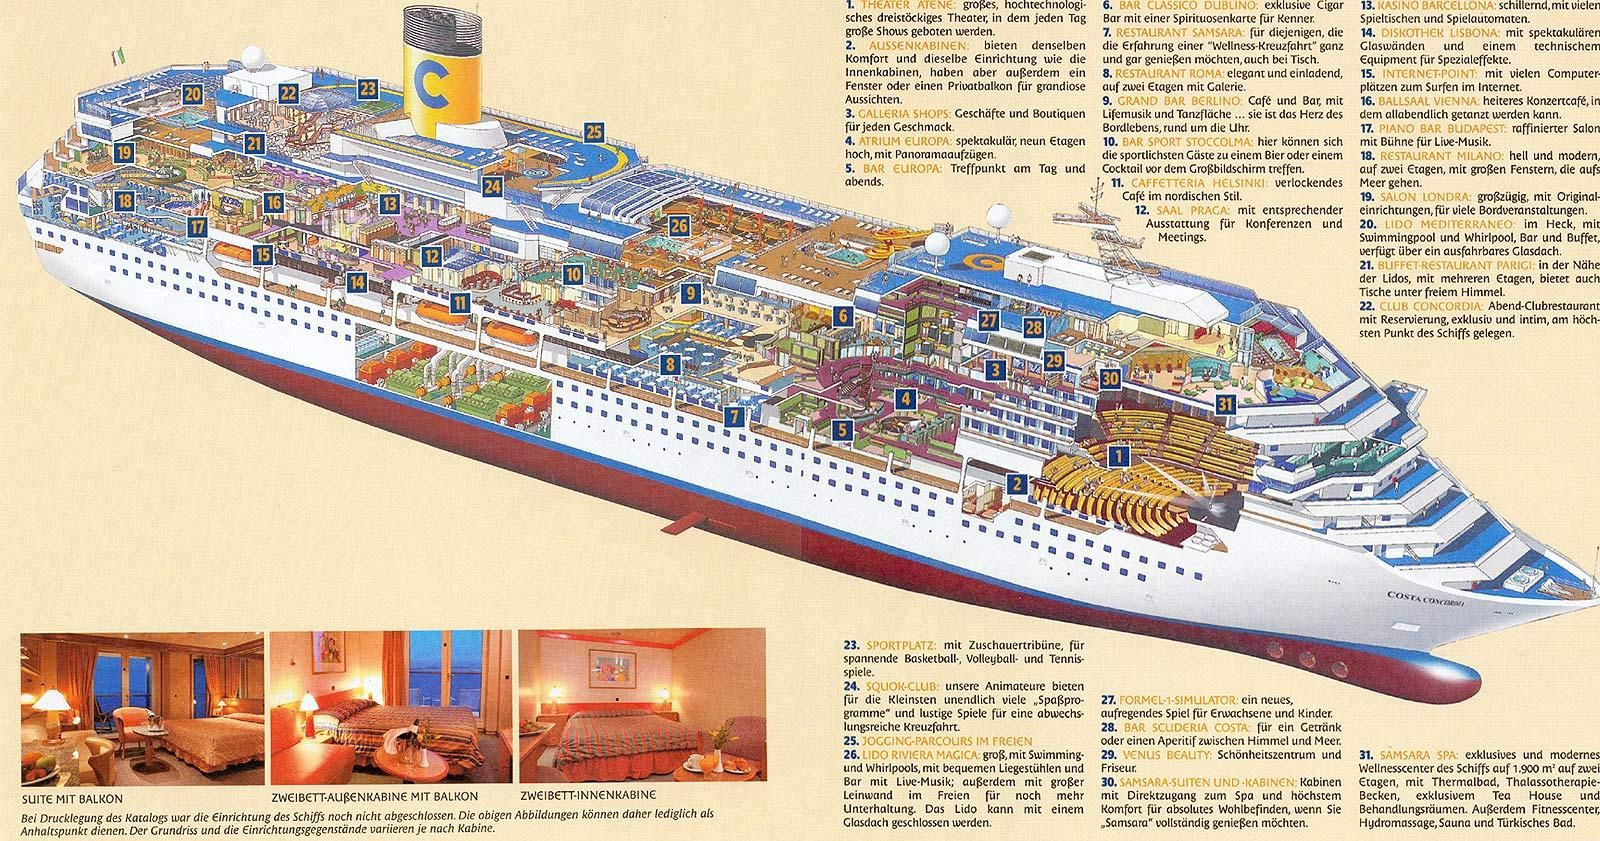 Costa Concordia Layout Italian Cruises Costa Concordia Disaster Majesty Of The Seas